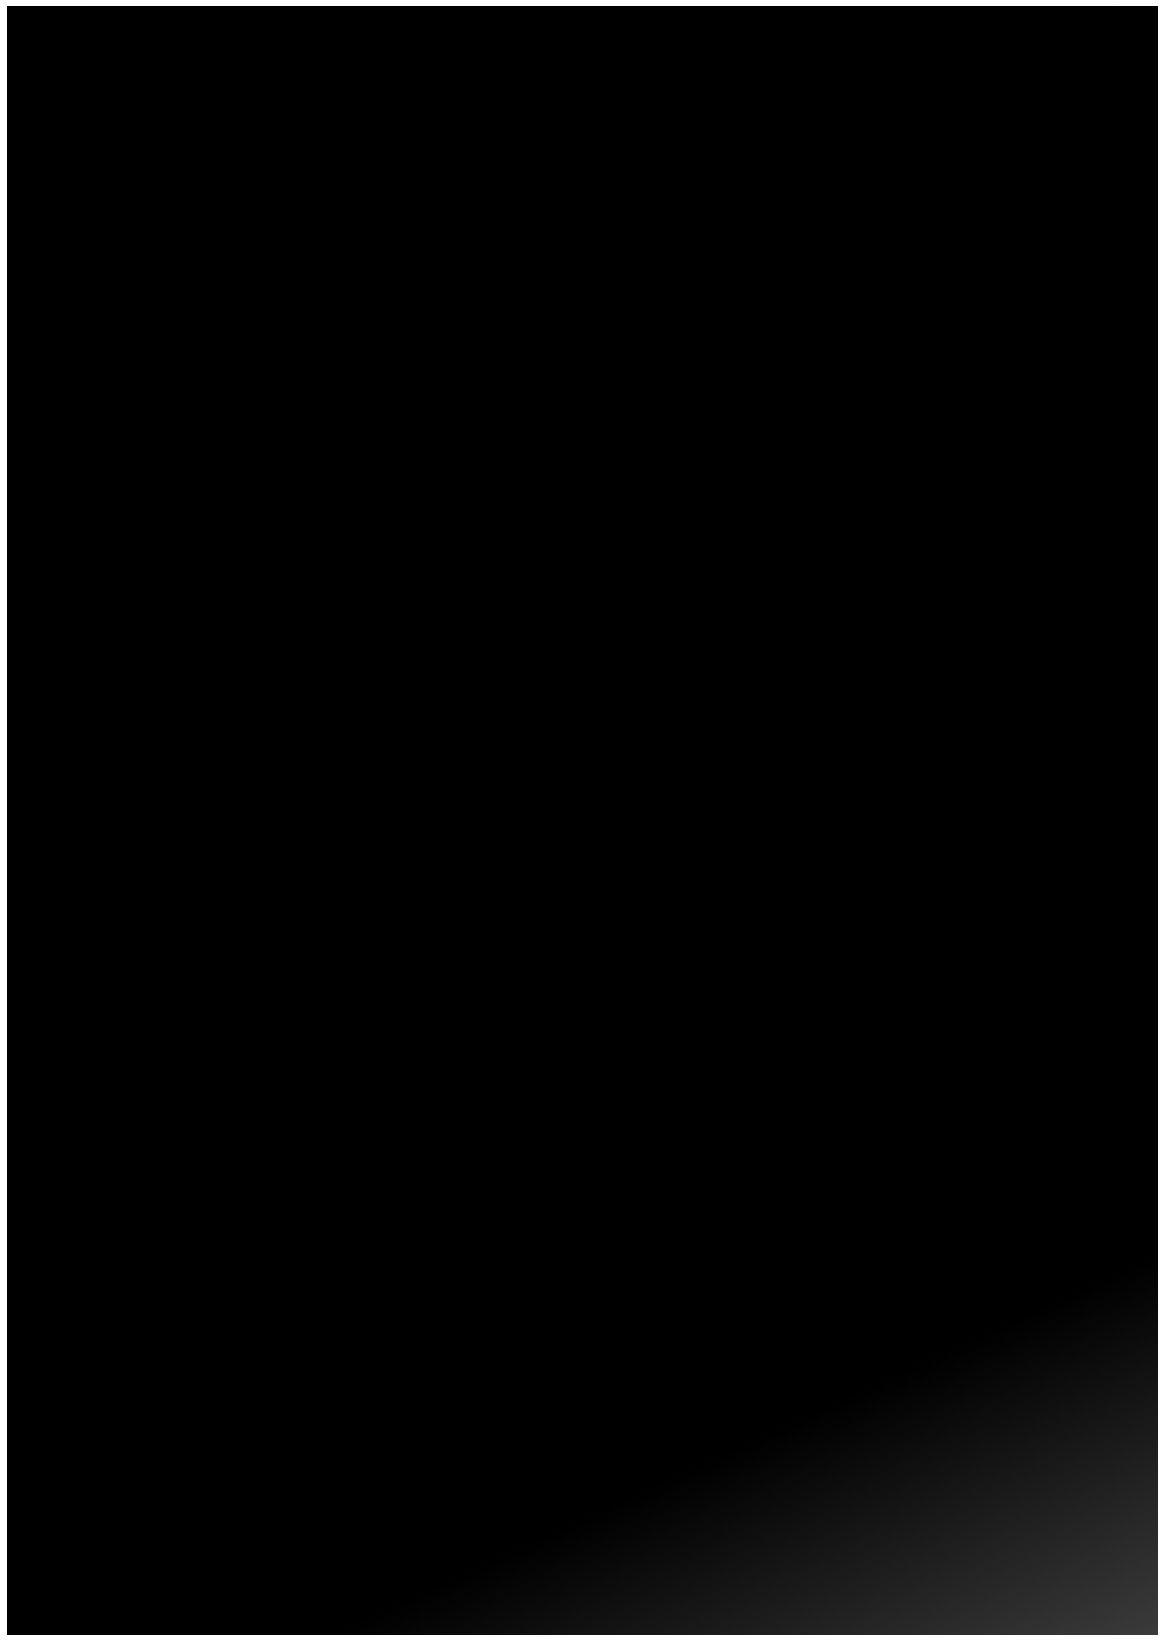 Karton kolor A1 czarny Lux Interdruk 120